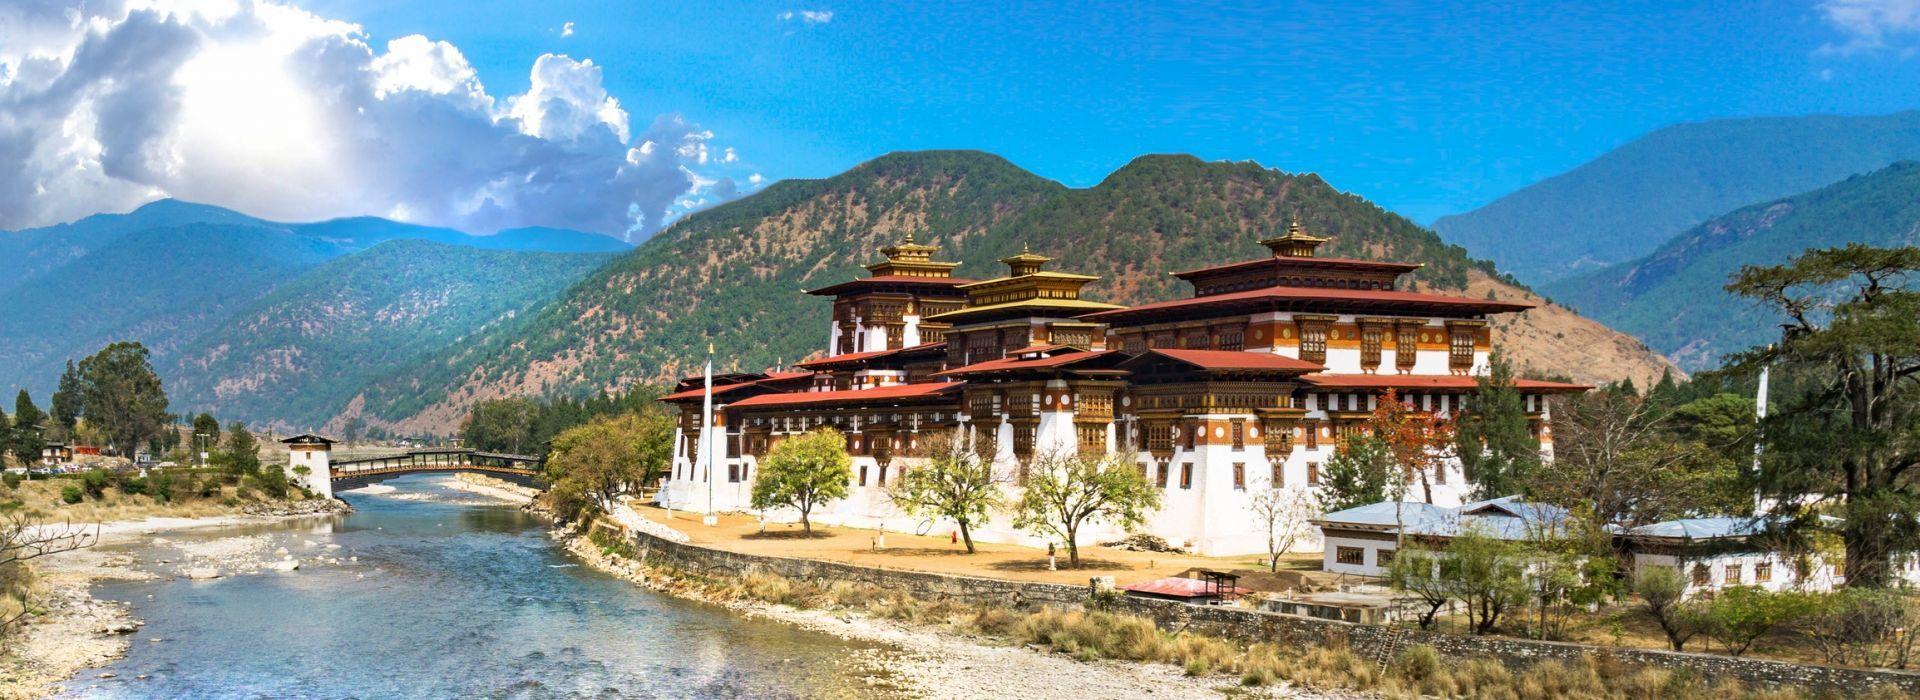 Natural landmarks sightseeing Tours in Bhutan